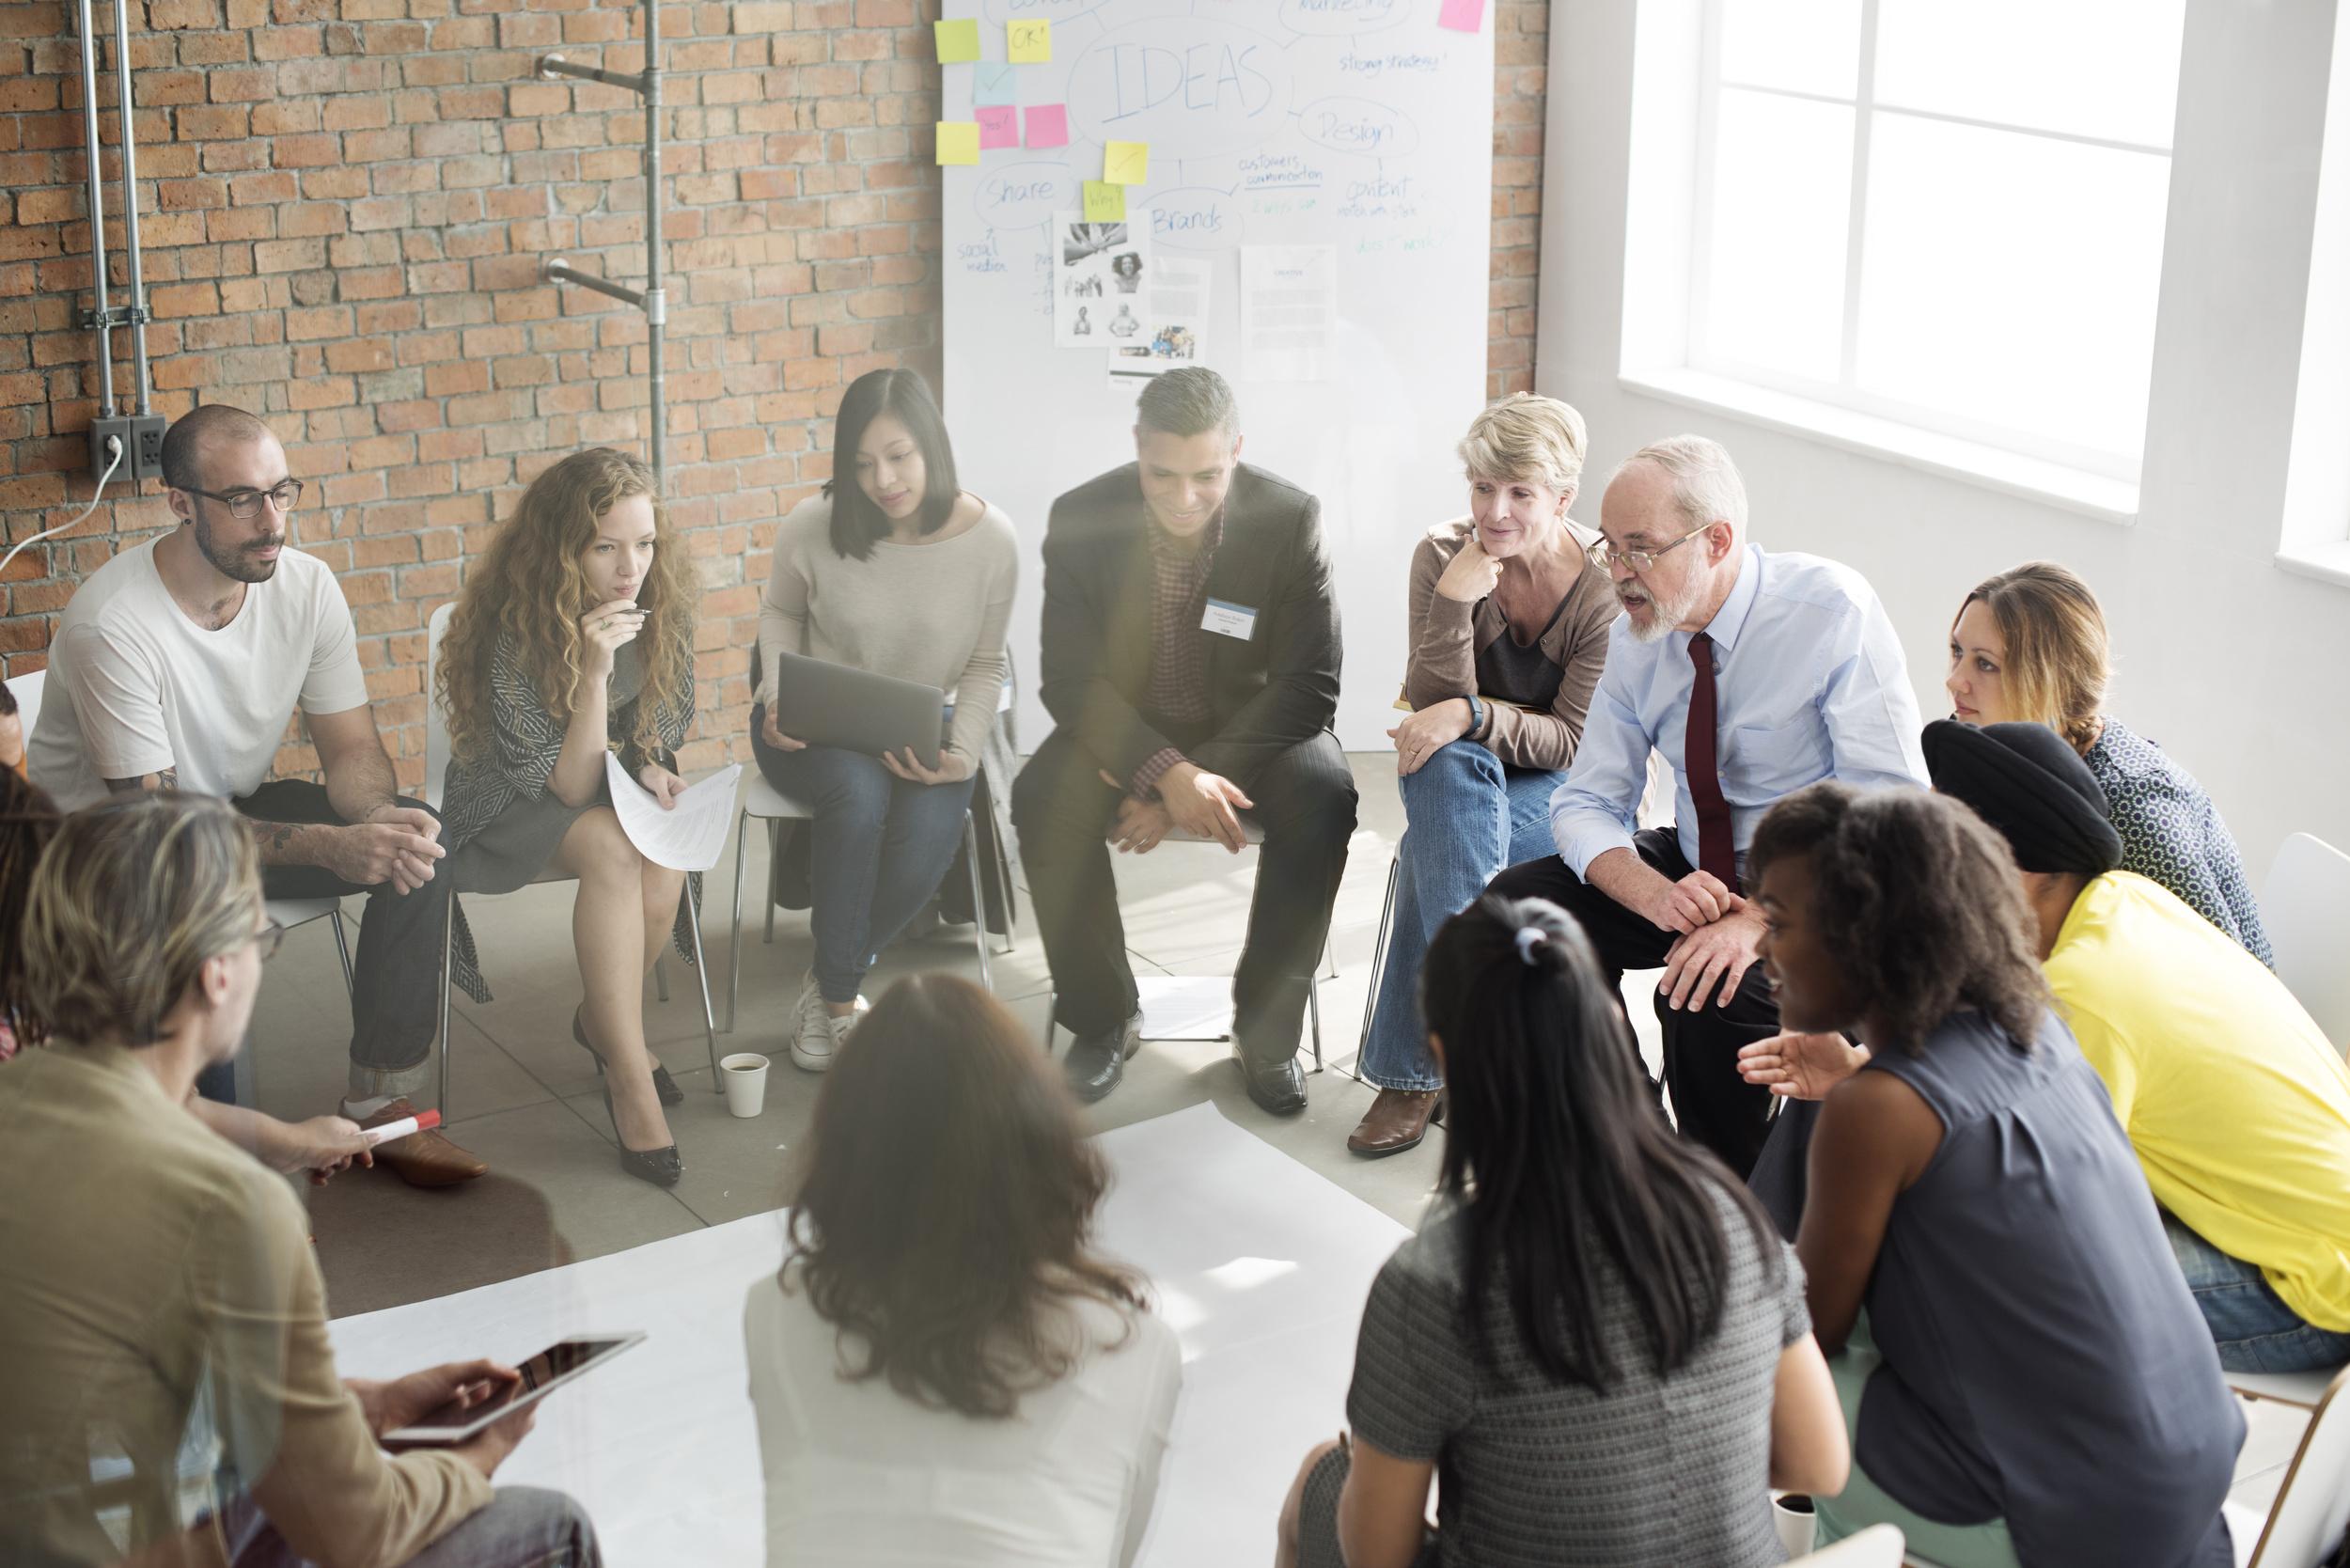 Group_Meeting_Breakout_Collaboration_Workshop.jpeg